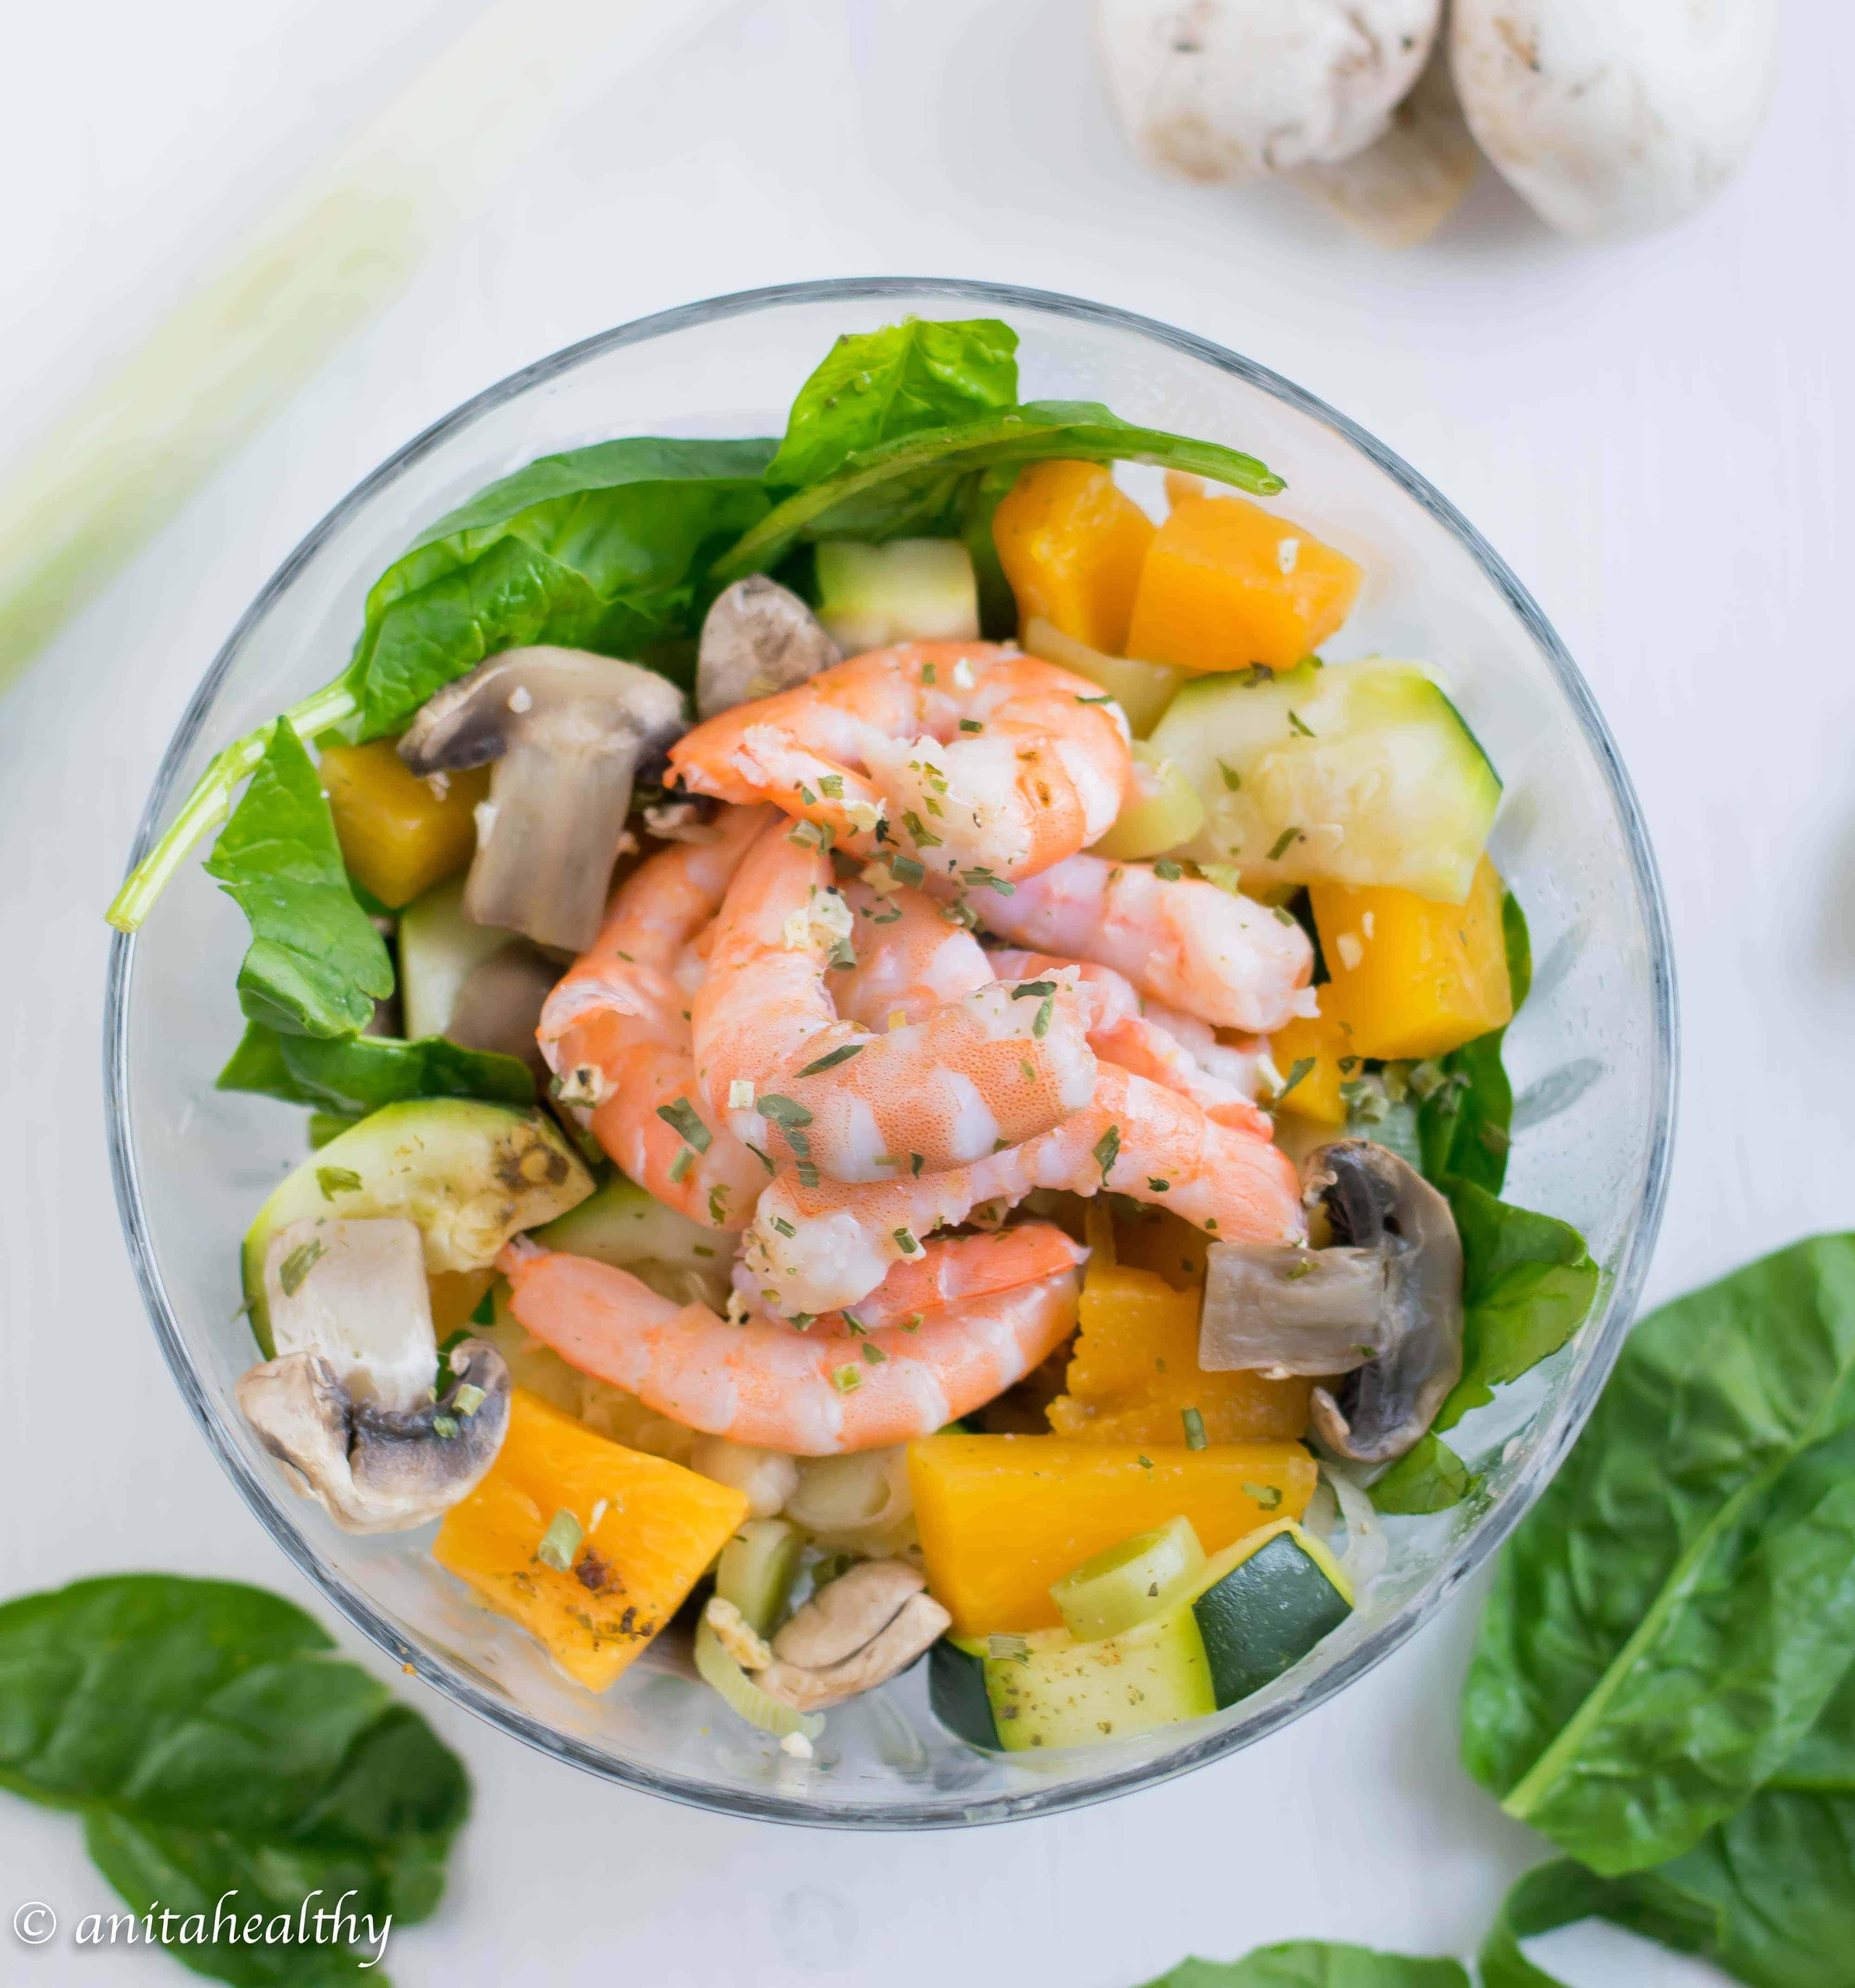 Salada de camarão | Anita Healthy